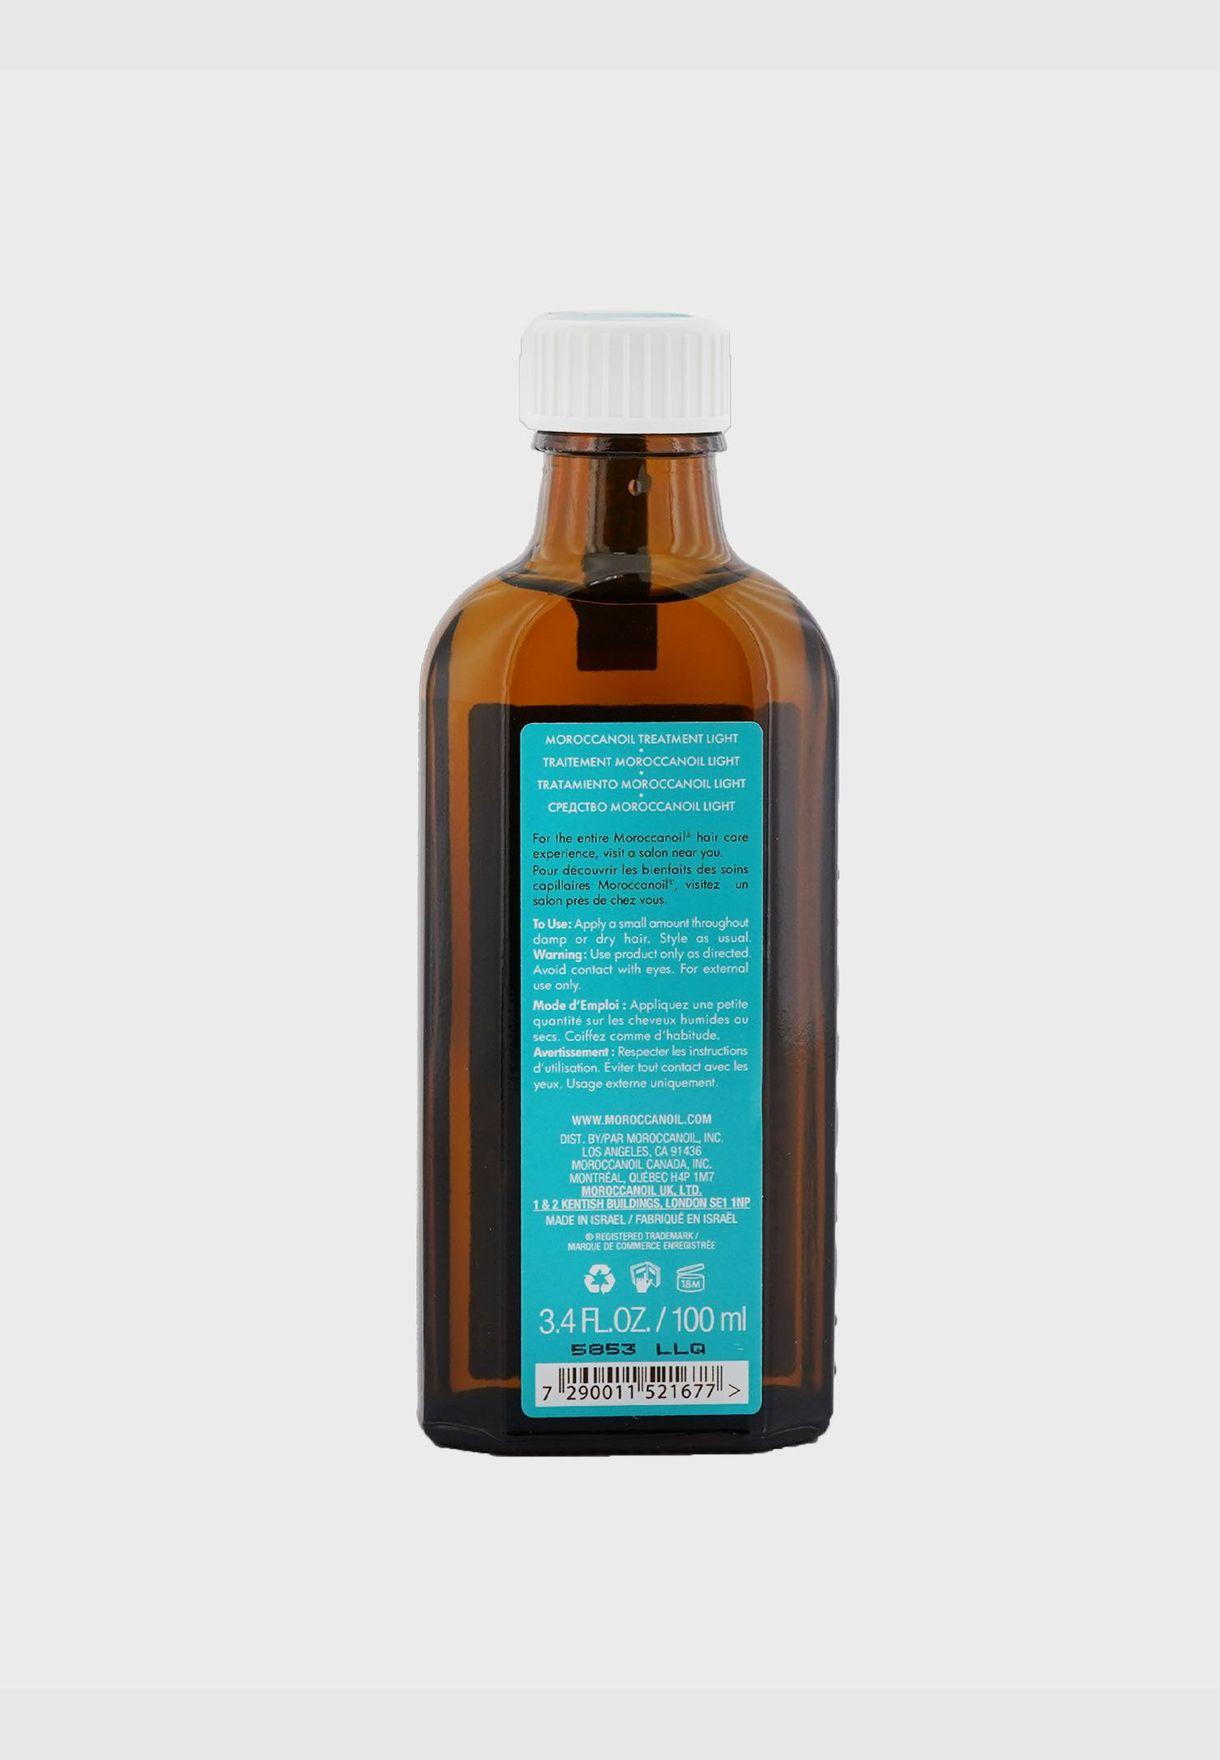 Moroccanoil Treatment - Light (For Fine or Light-Colored Hair)